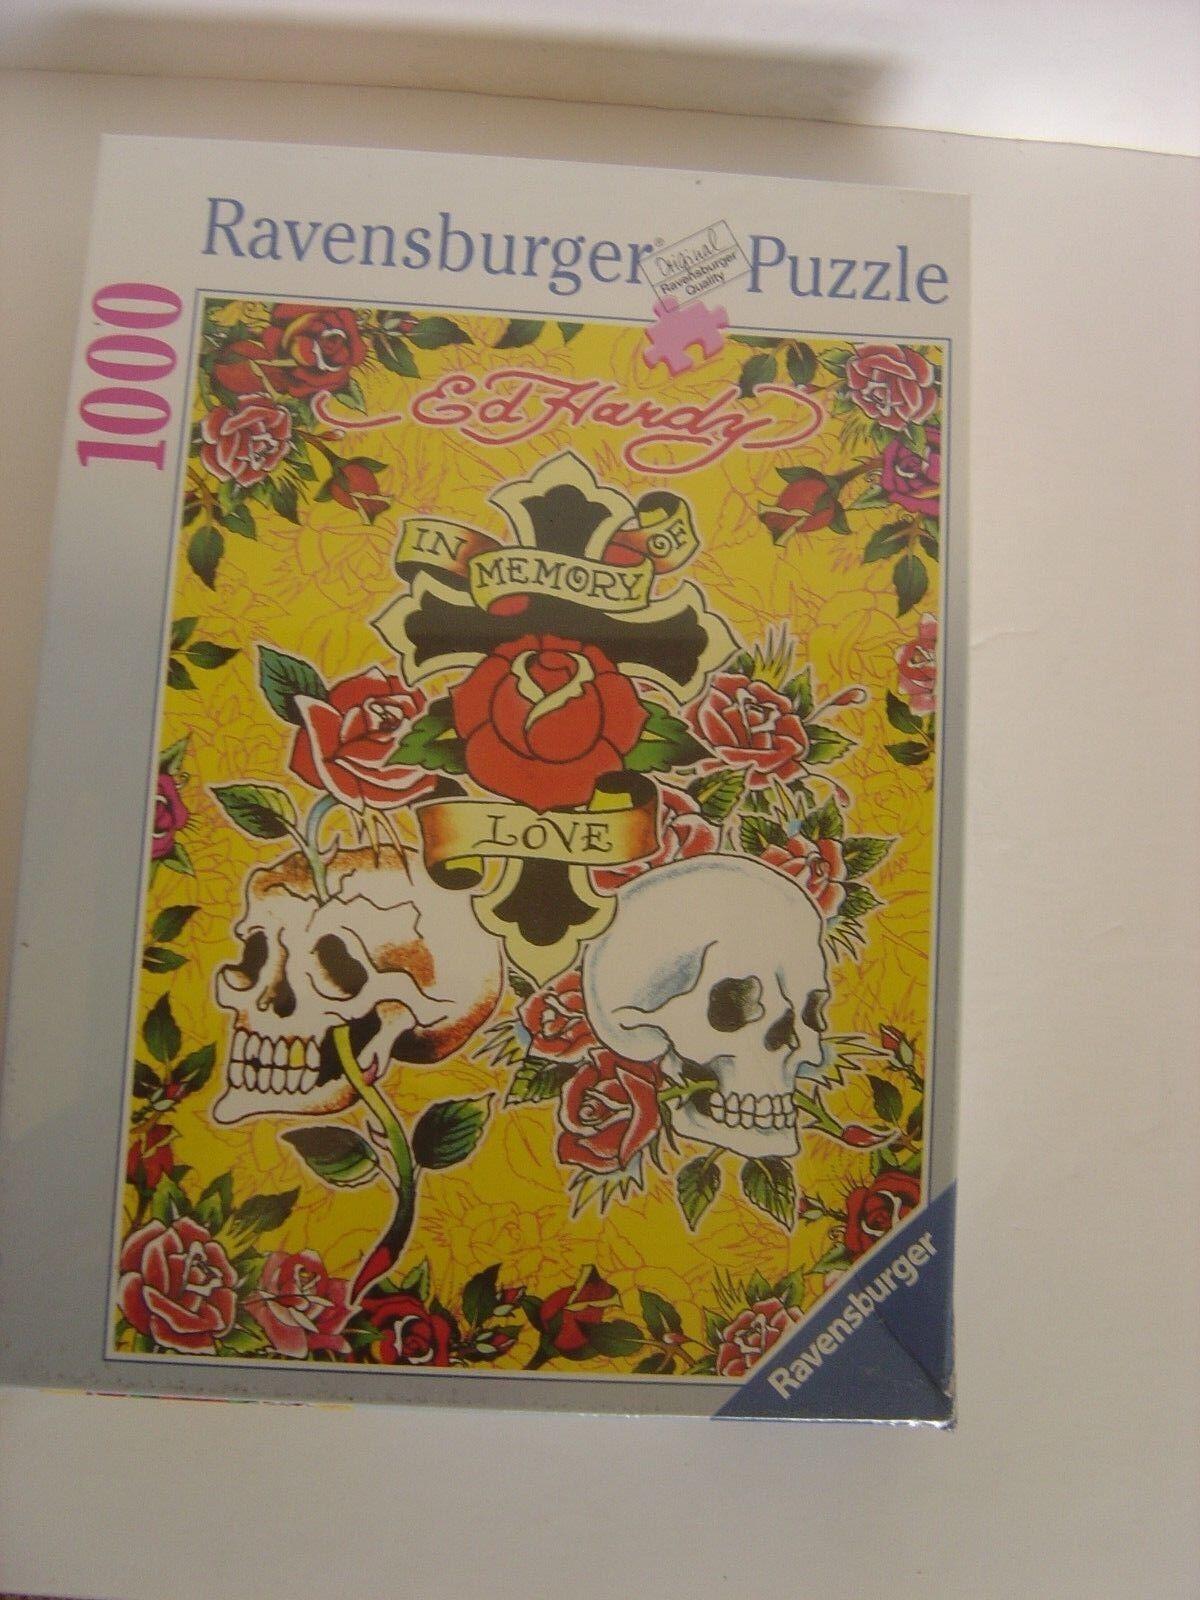 Ravensburger Puzzle Puzzles Ed Hardy Memory of love skulls roses tattoo tribal